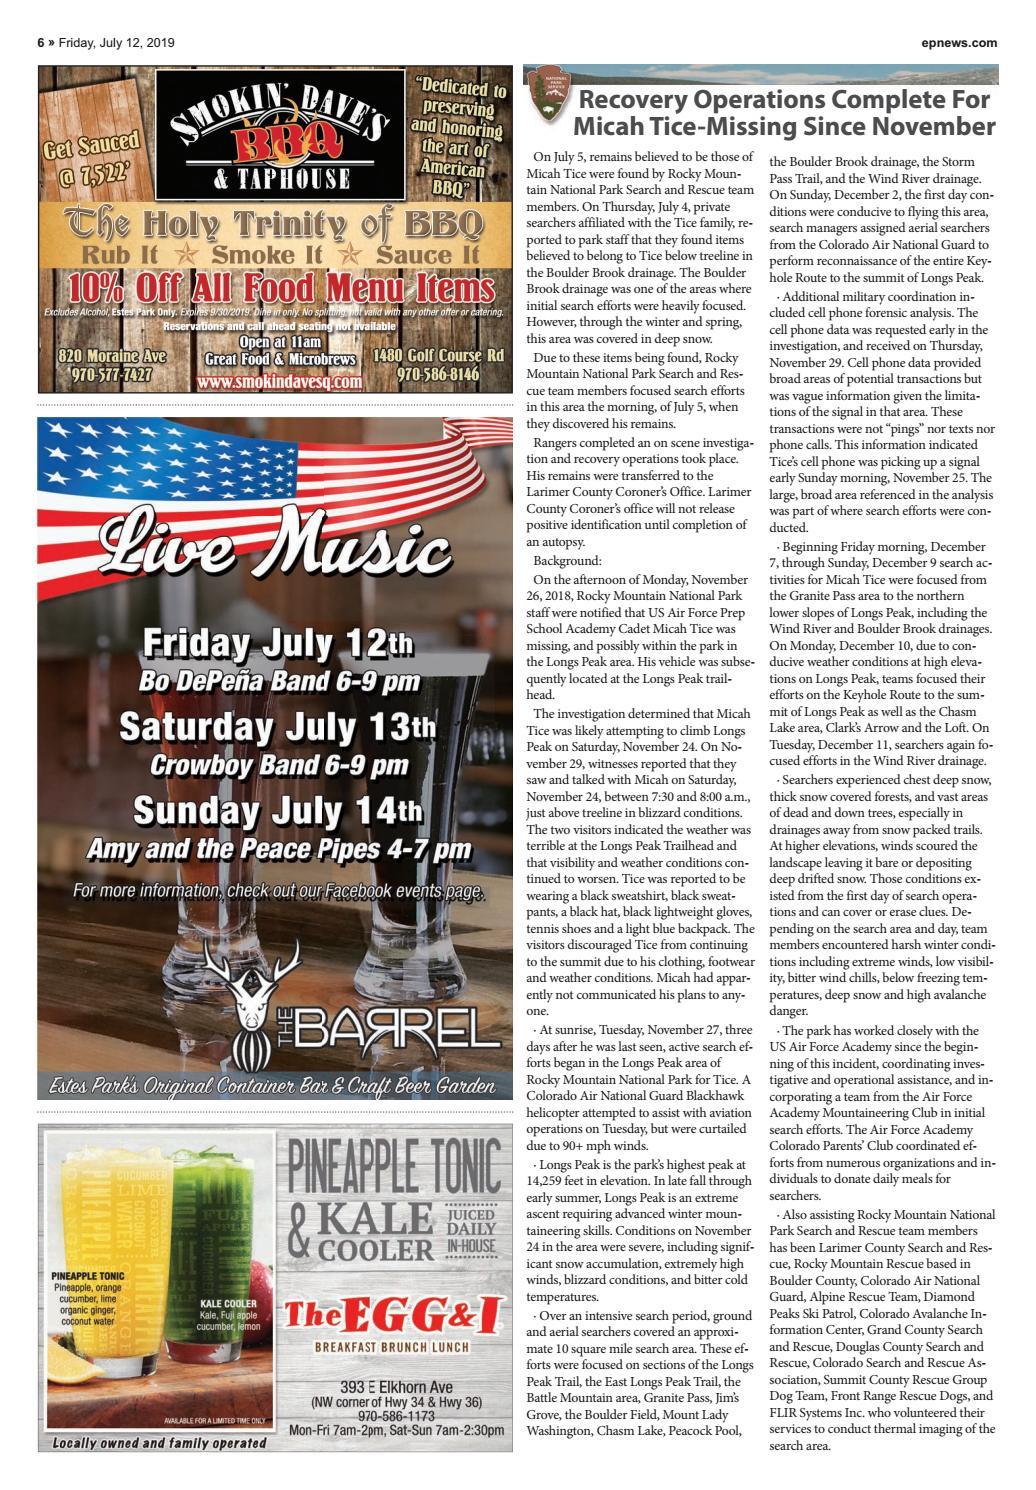 Estes Park News, July 12, 2019 by Estes Park News, Inc - issuu